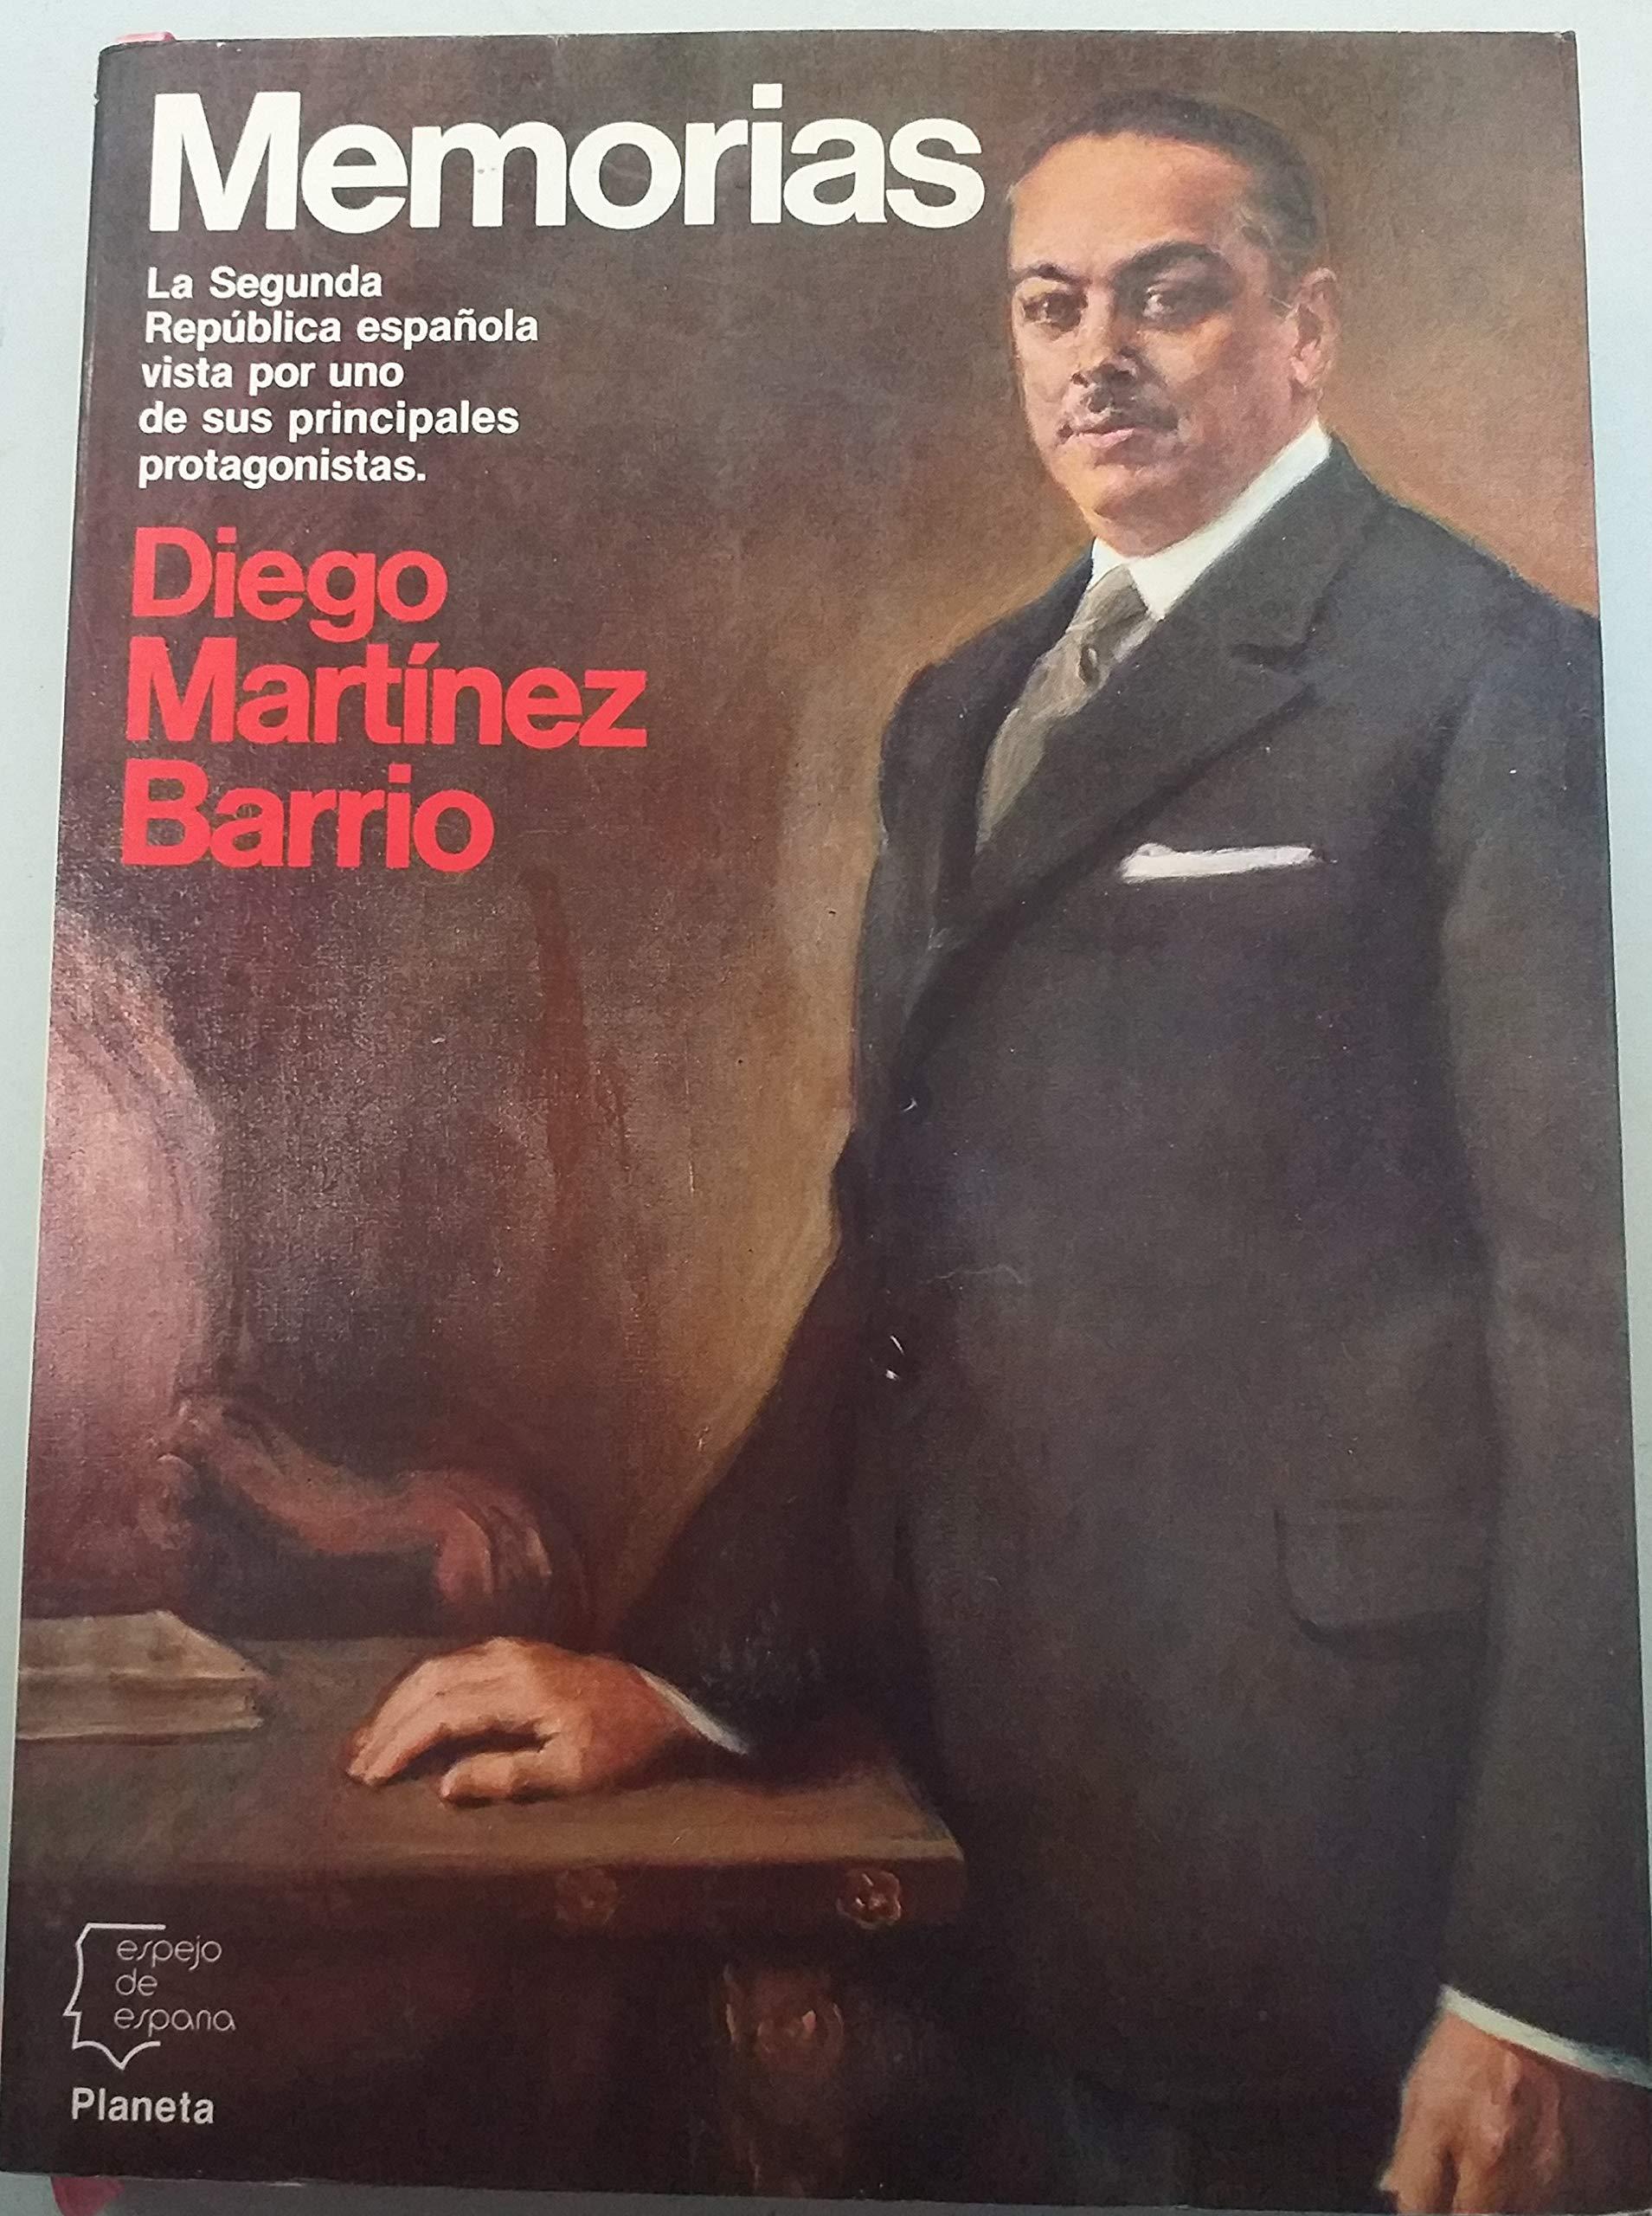 Memorias . Diego Martínez barrio (Espejo de España): Amazon.es: Martínez Barrio, Diego: Libros